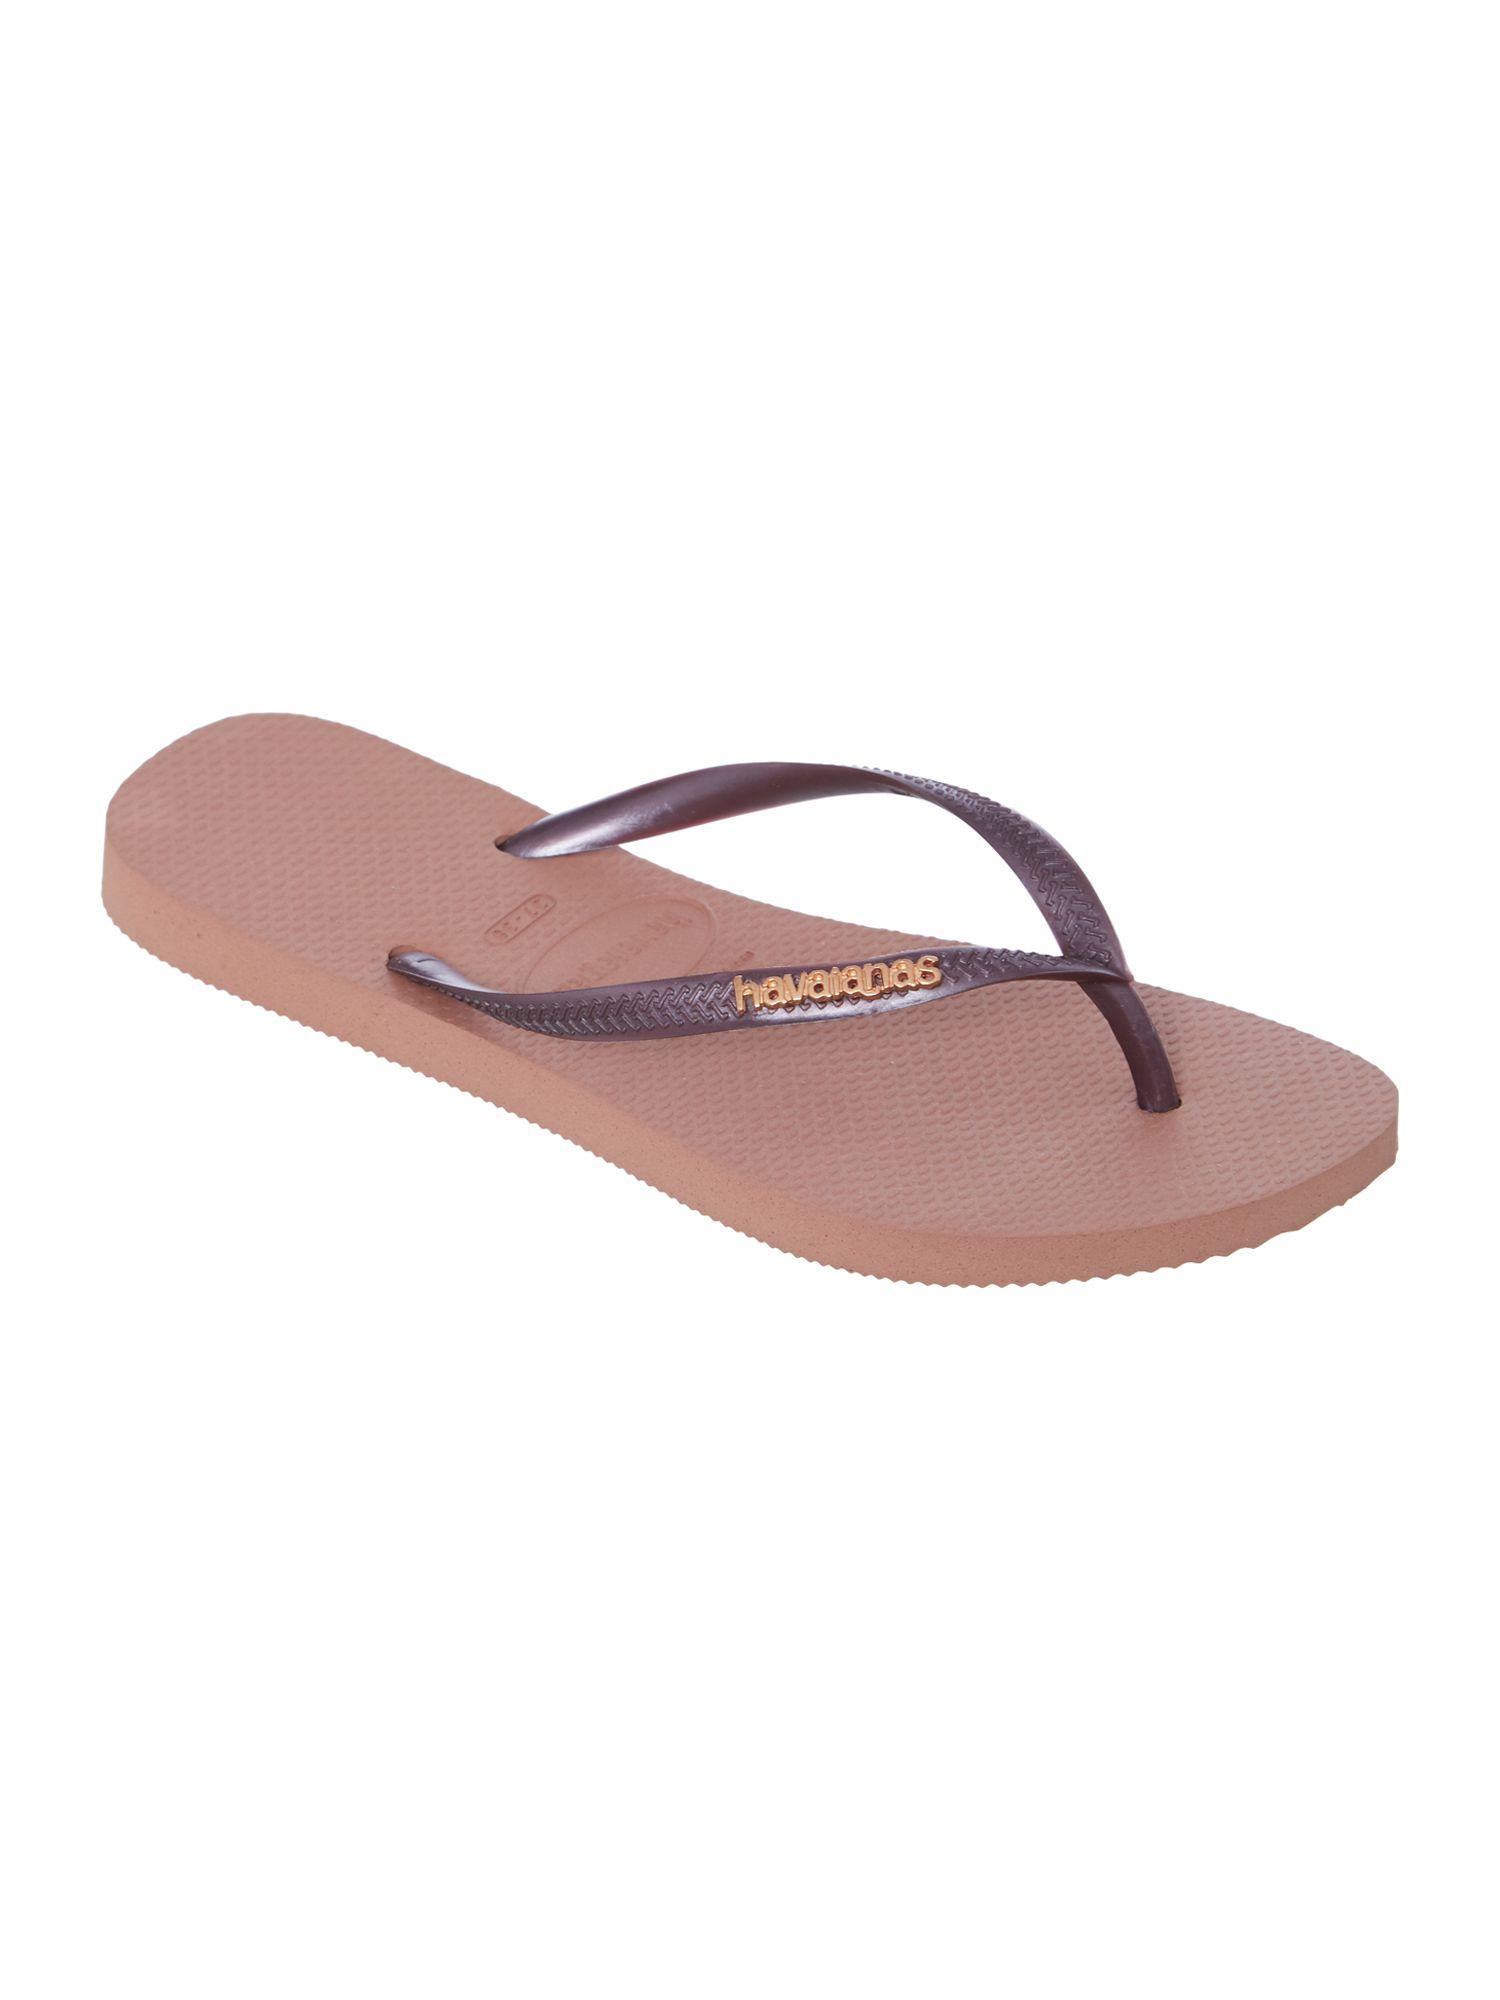 Havaianas Slim Logo Metallic Flip Flop In Pink Rose Gold  Lyst-5704